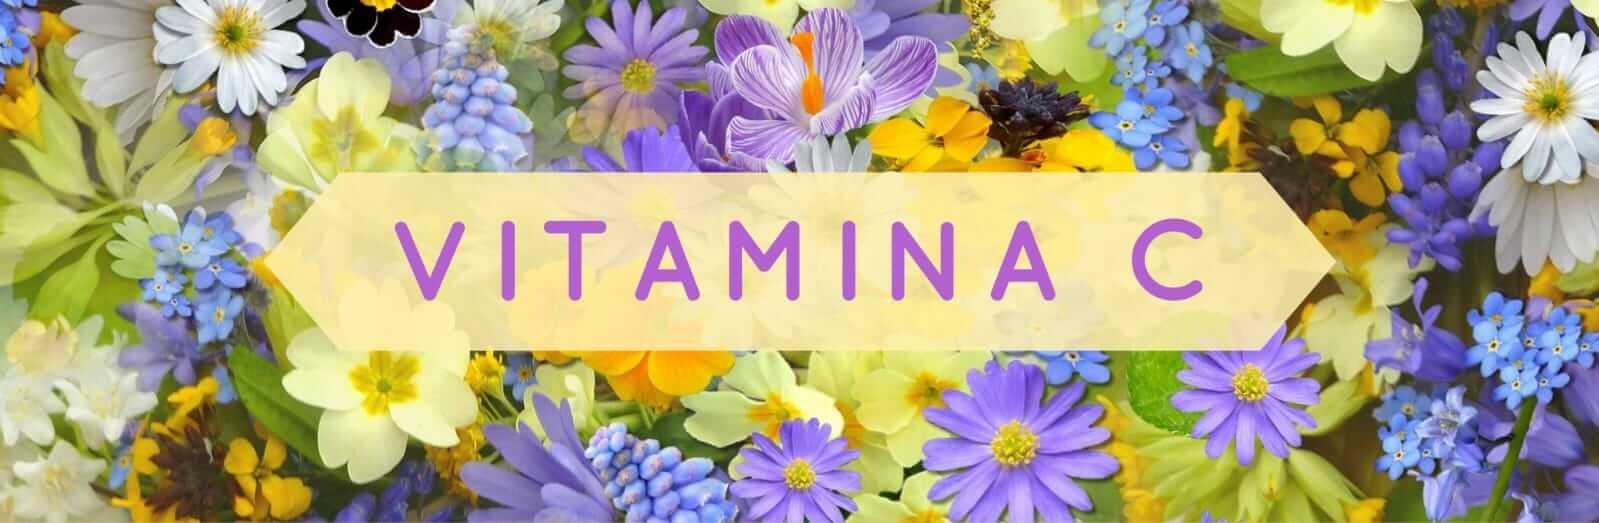 Immagine in evidenza Vitamina C